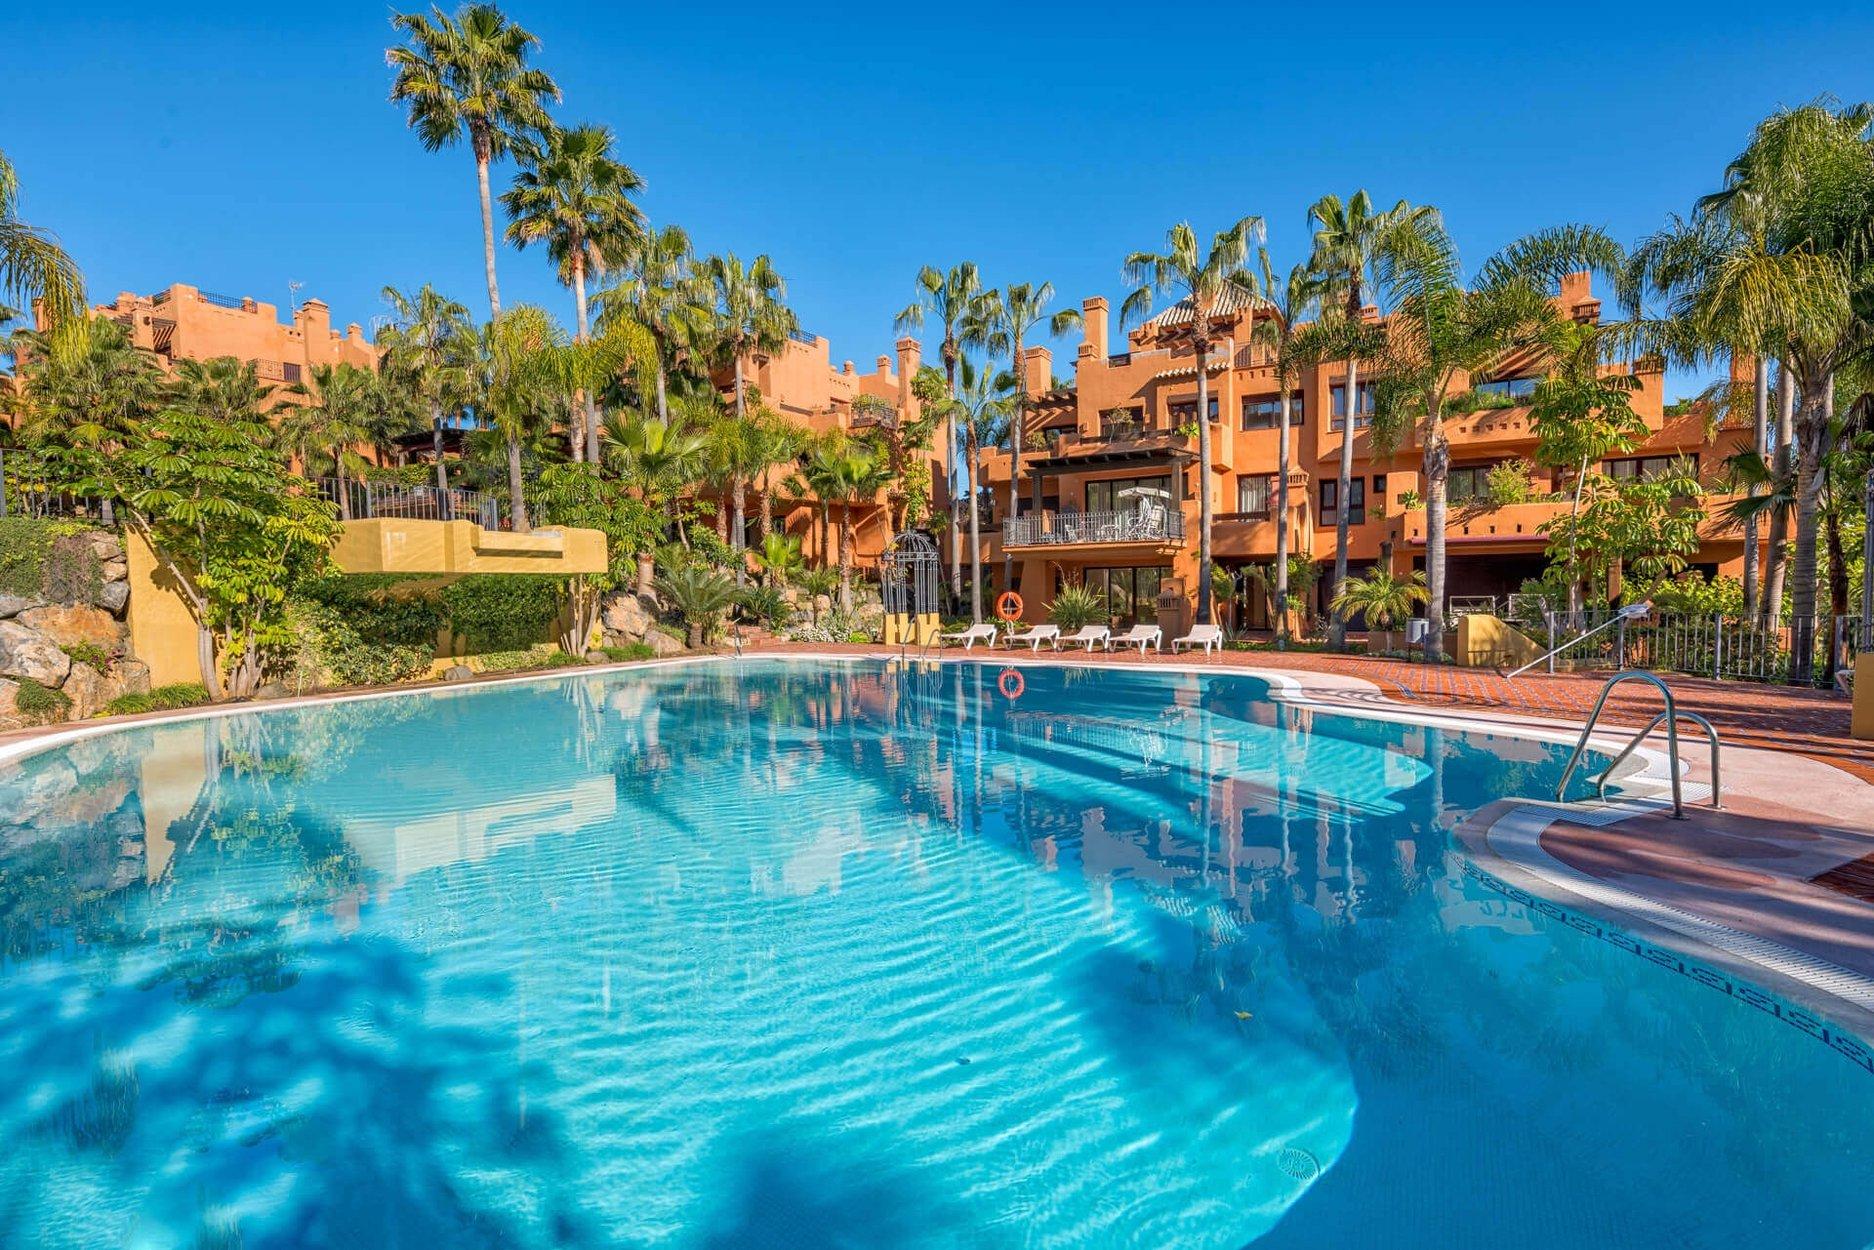 aaa3 bedroom Apartment in Nueva Andalucia, Marbella | M159004